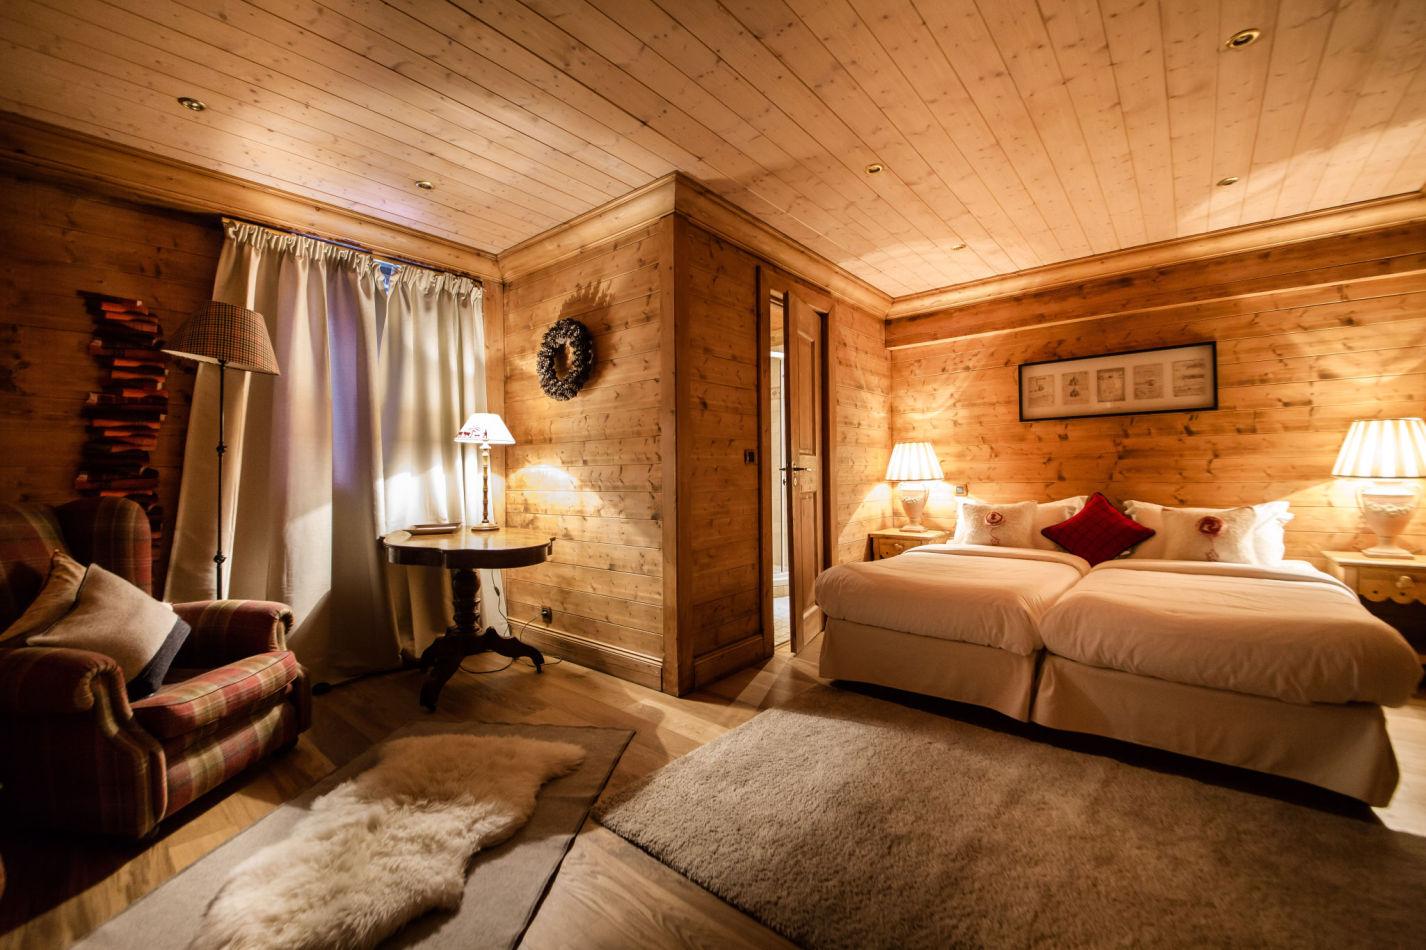 hermine-bedroom-image-5